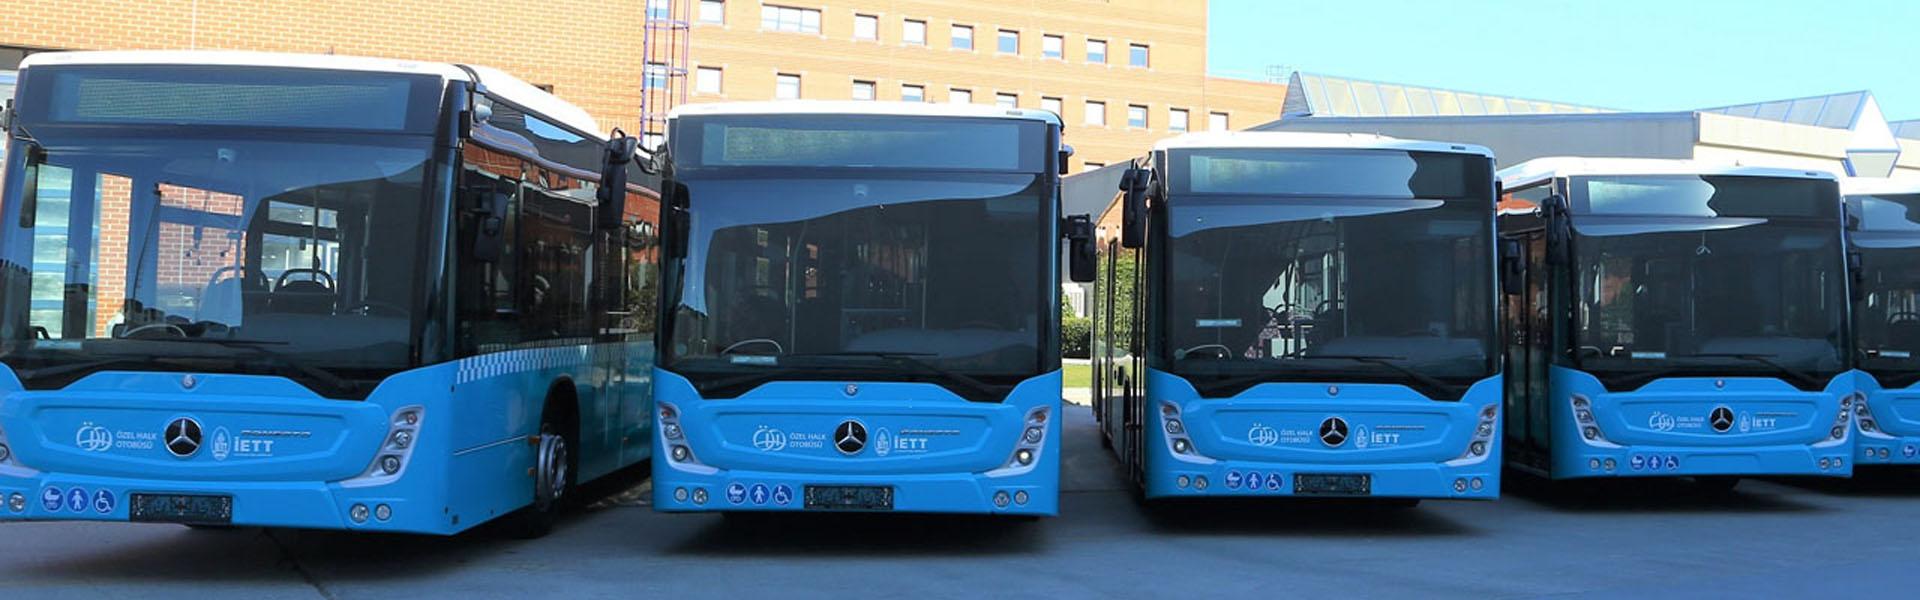 mercedes otobüs servisi31